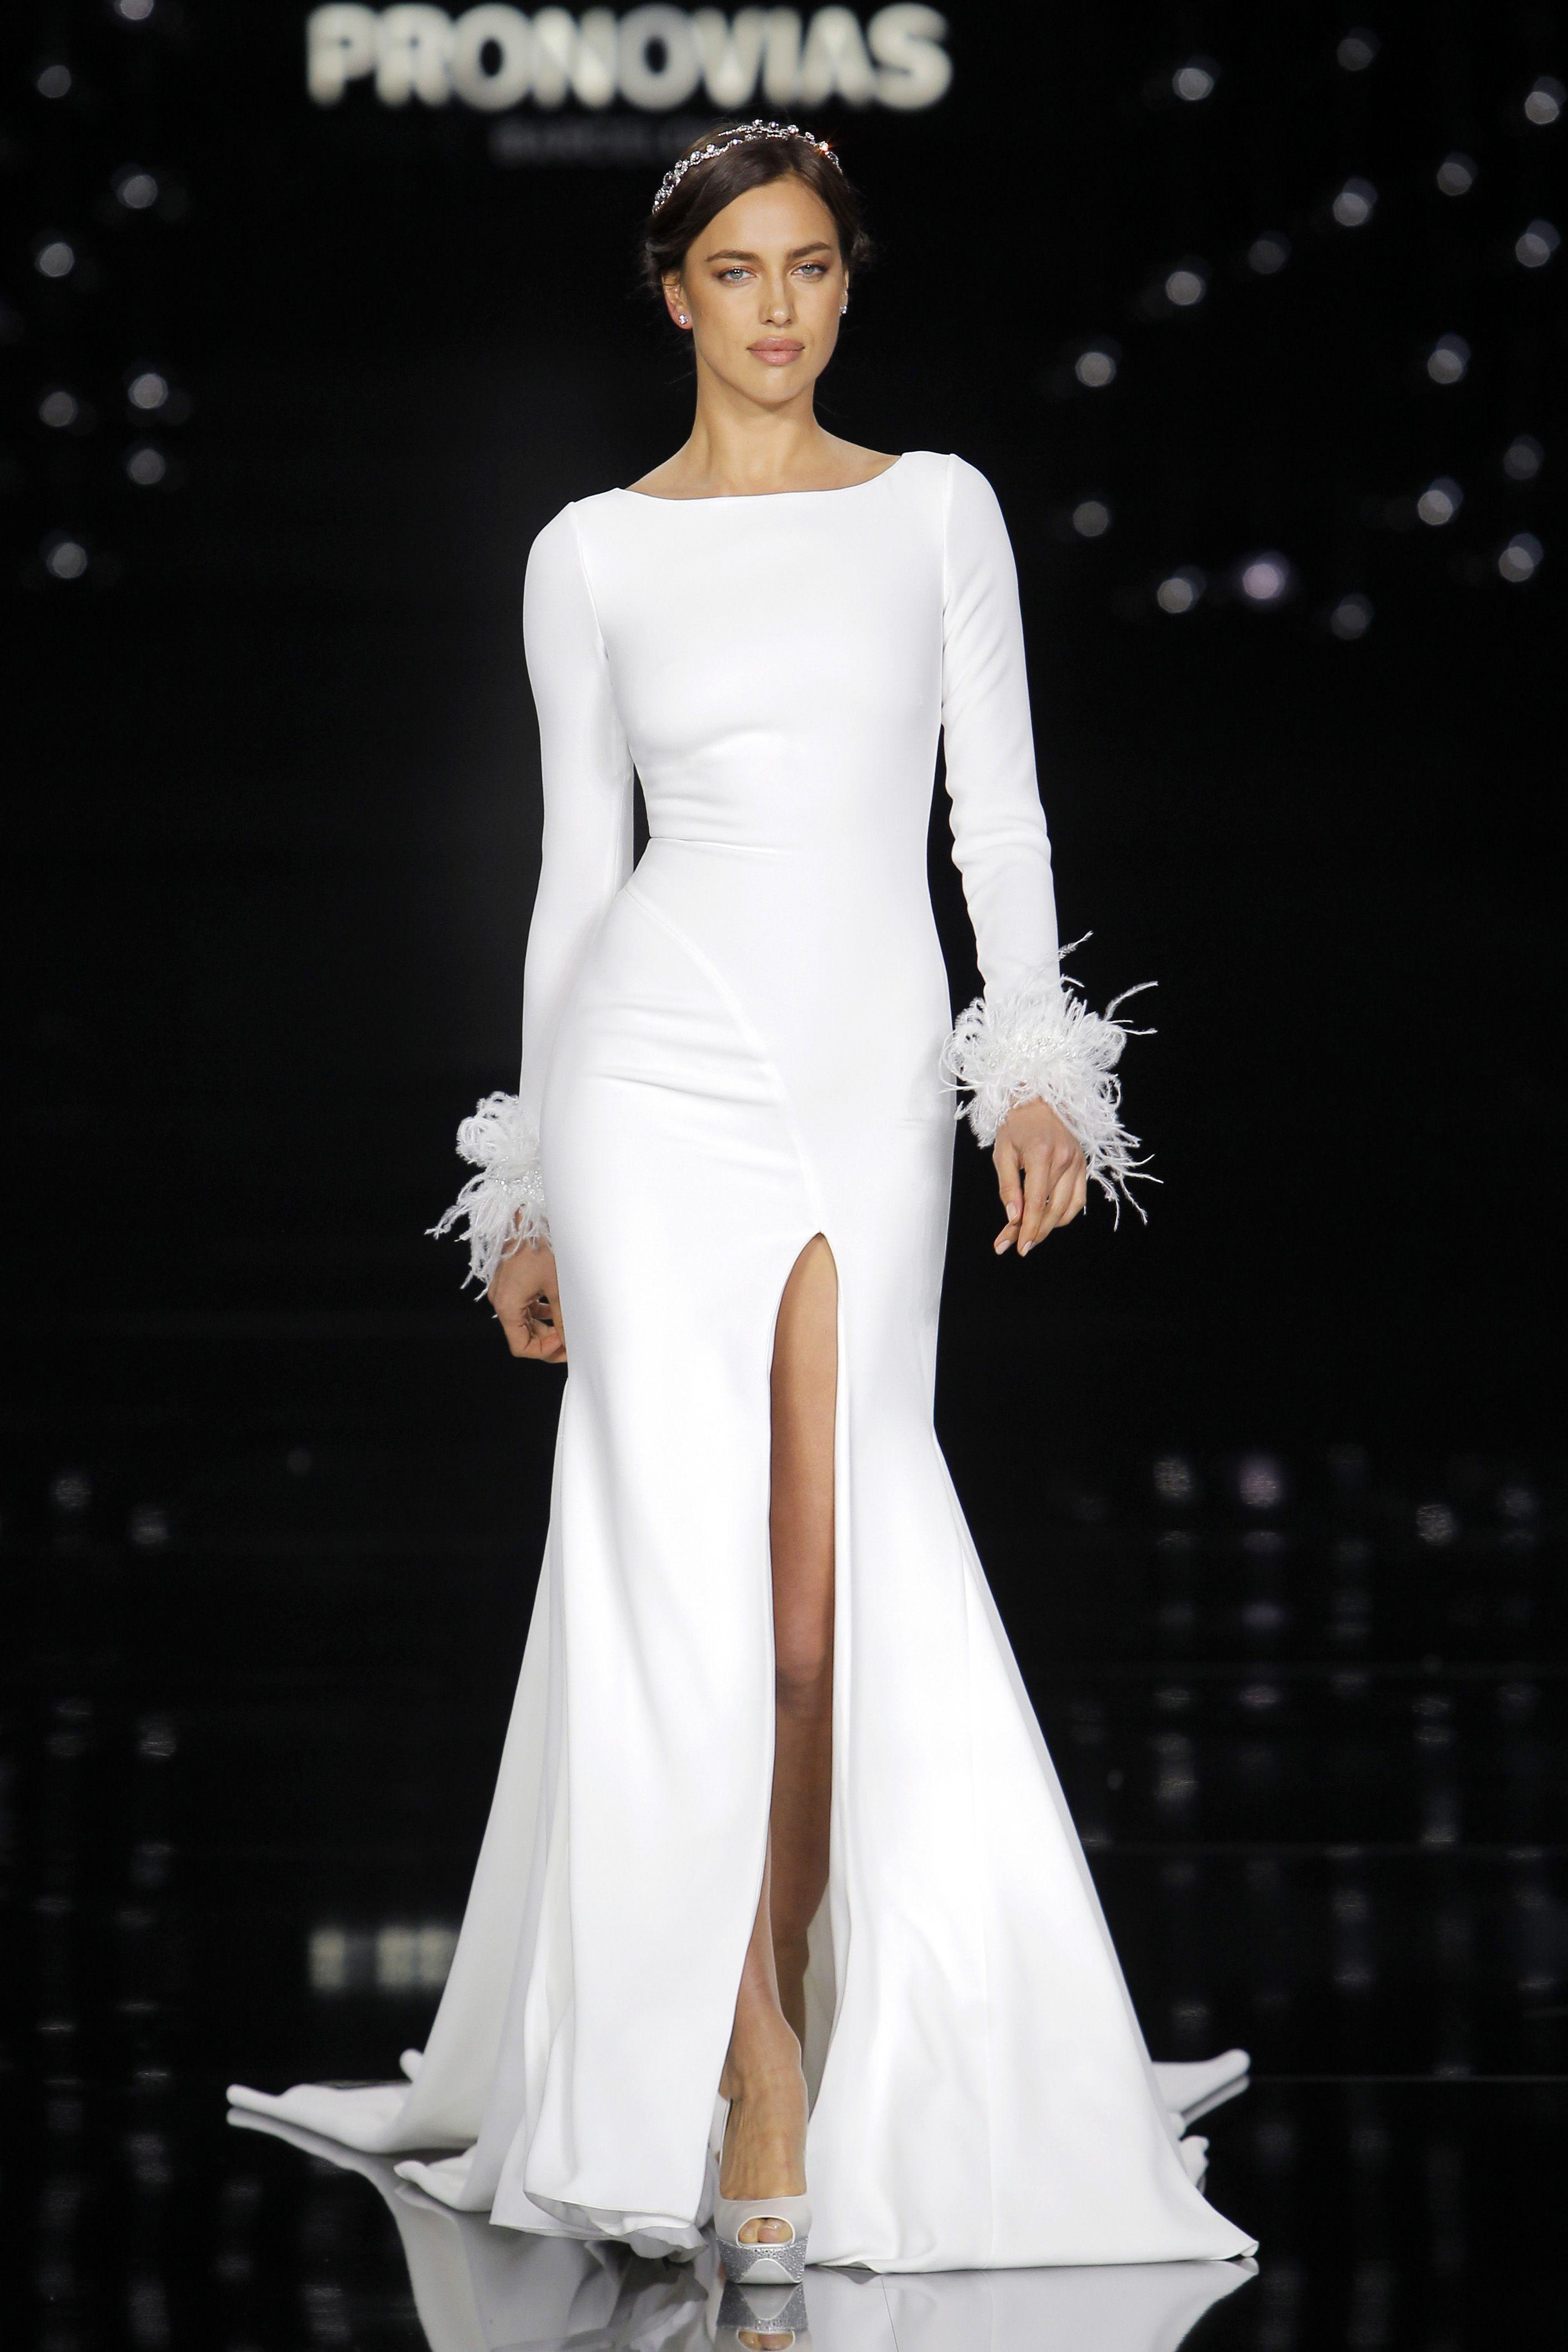 b2ef3ce12cae3 Irina Shayk in Nuria dress made of crepe